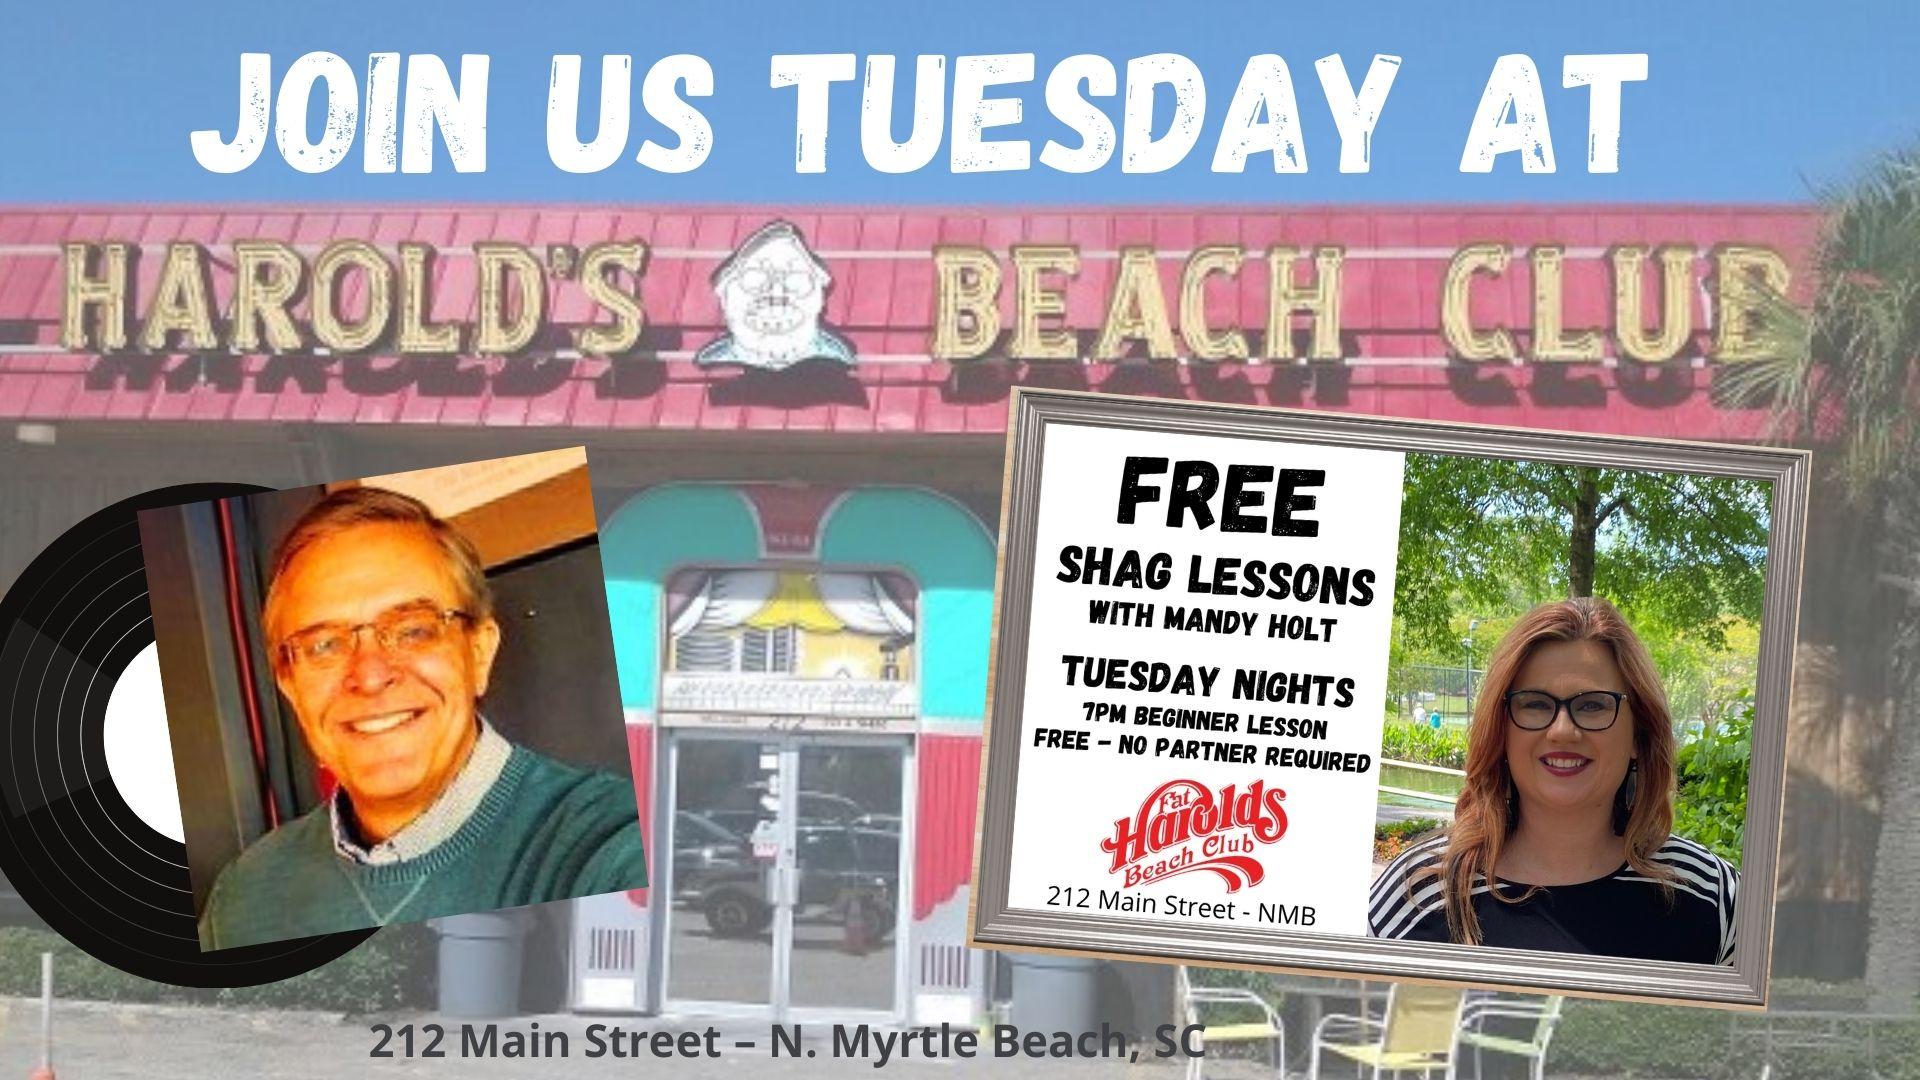 Free Shag Lessons on Tuesday